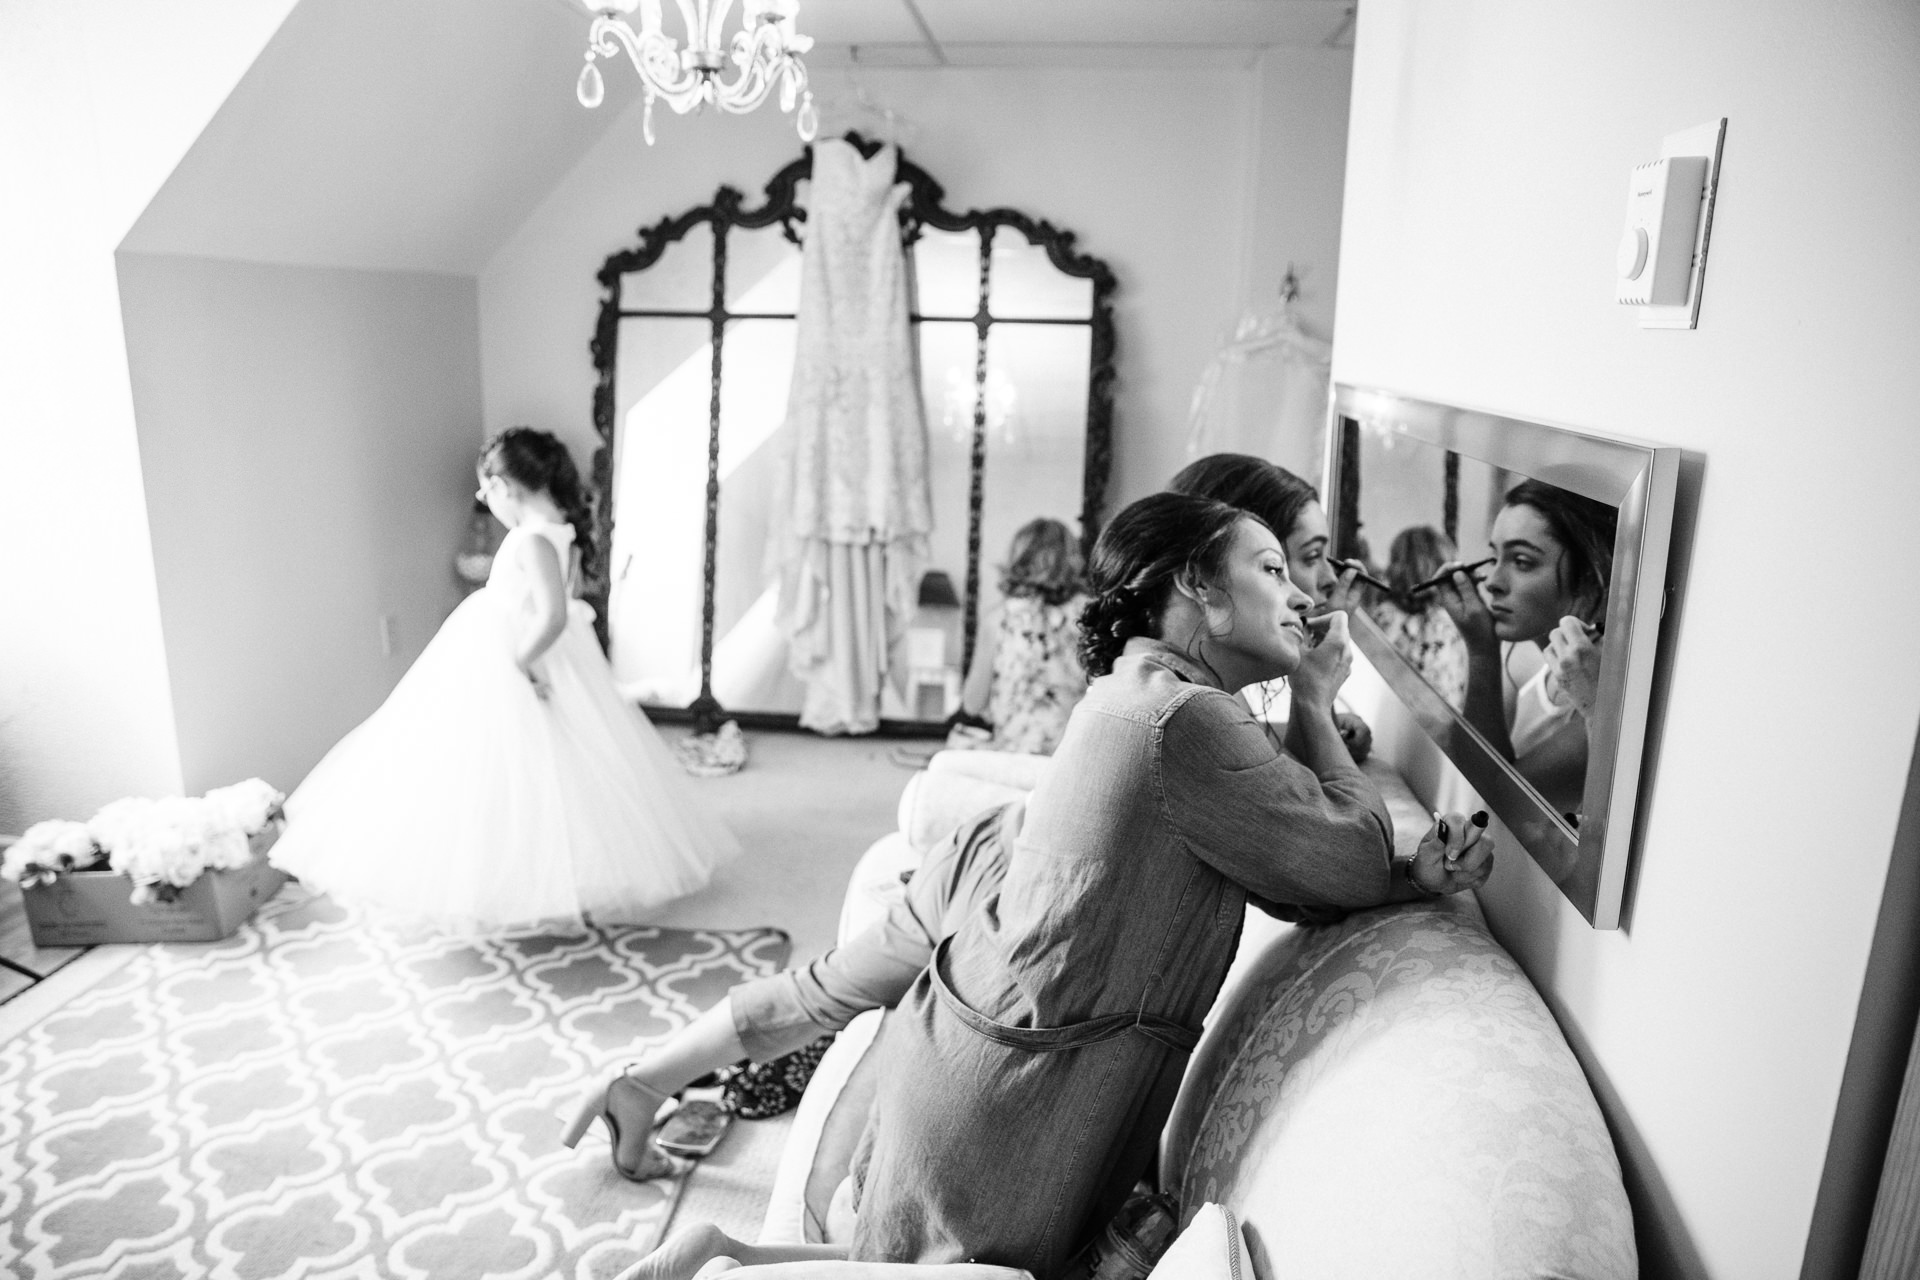 Grant Beachy Tammy Chris wedding photography goshen Saint Joseph veranda whitcomb-017.jpg